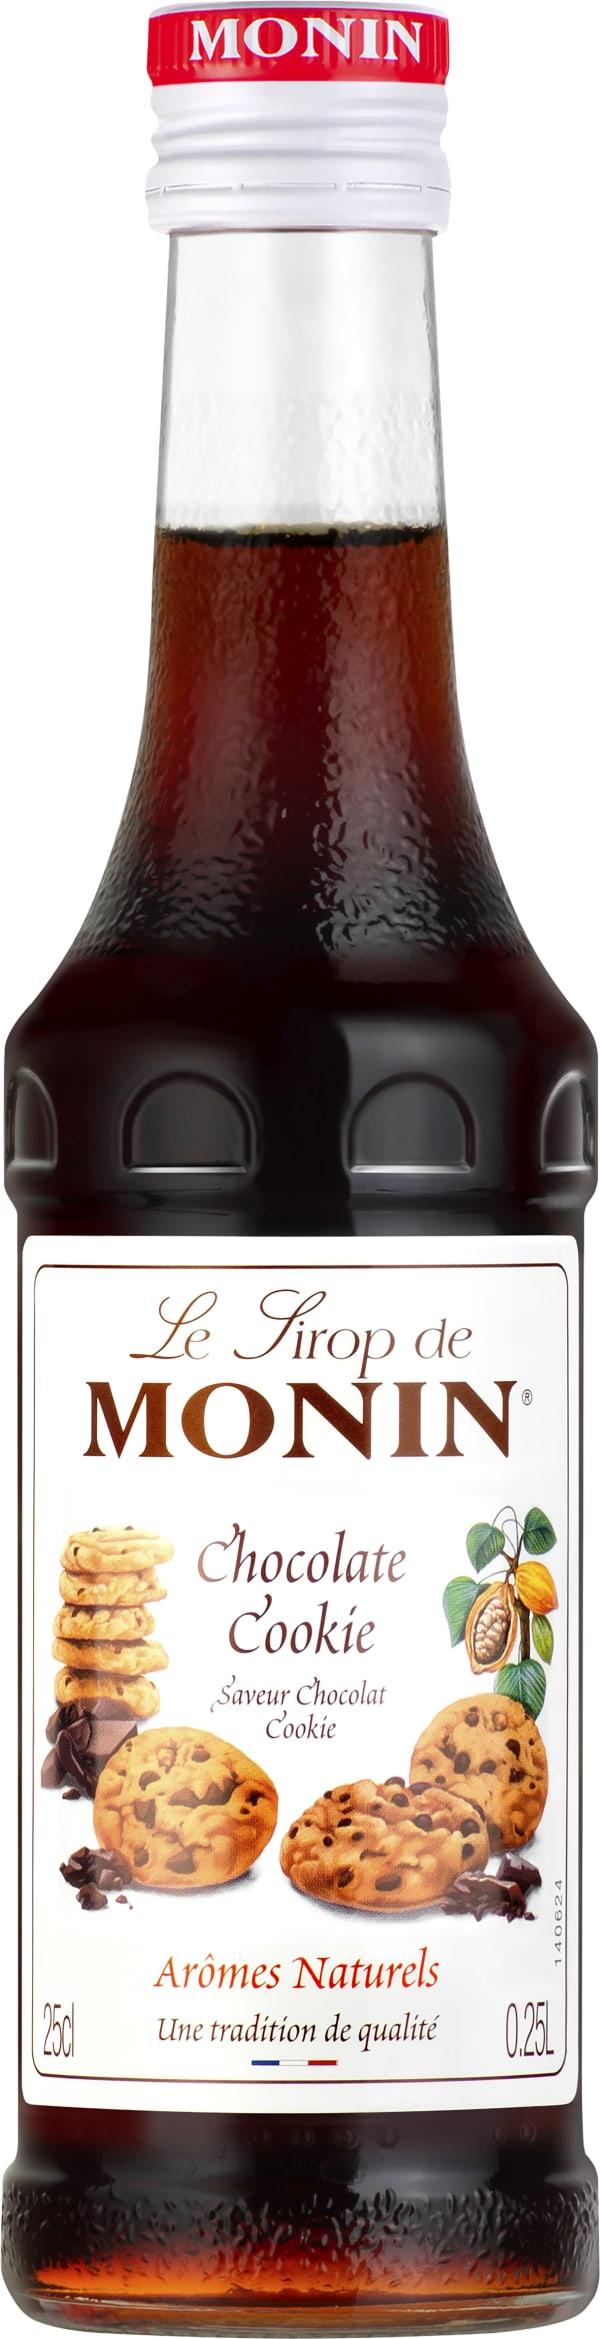 Le Sirop de Monin Chocolate Cookie